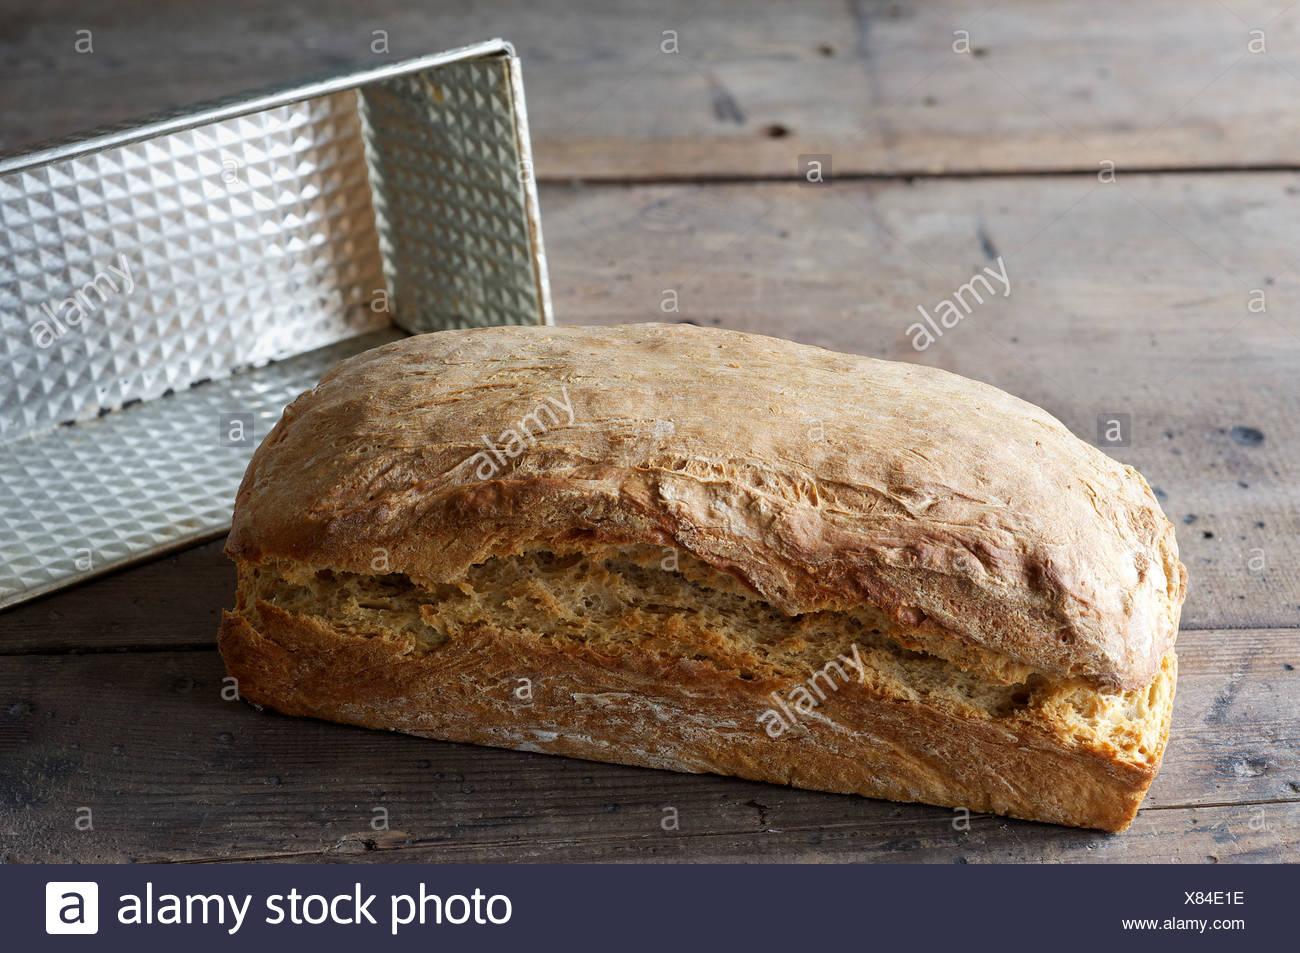 Spelt bread, homemade, baking tray - Stock Image